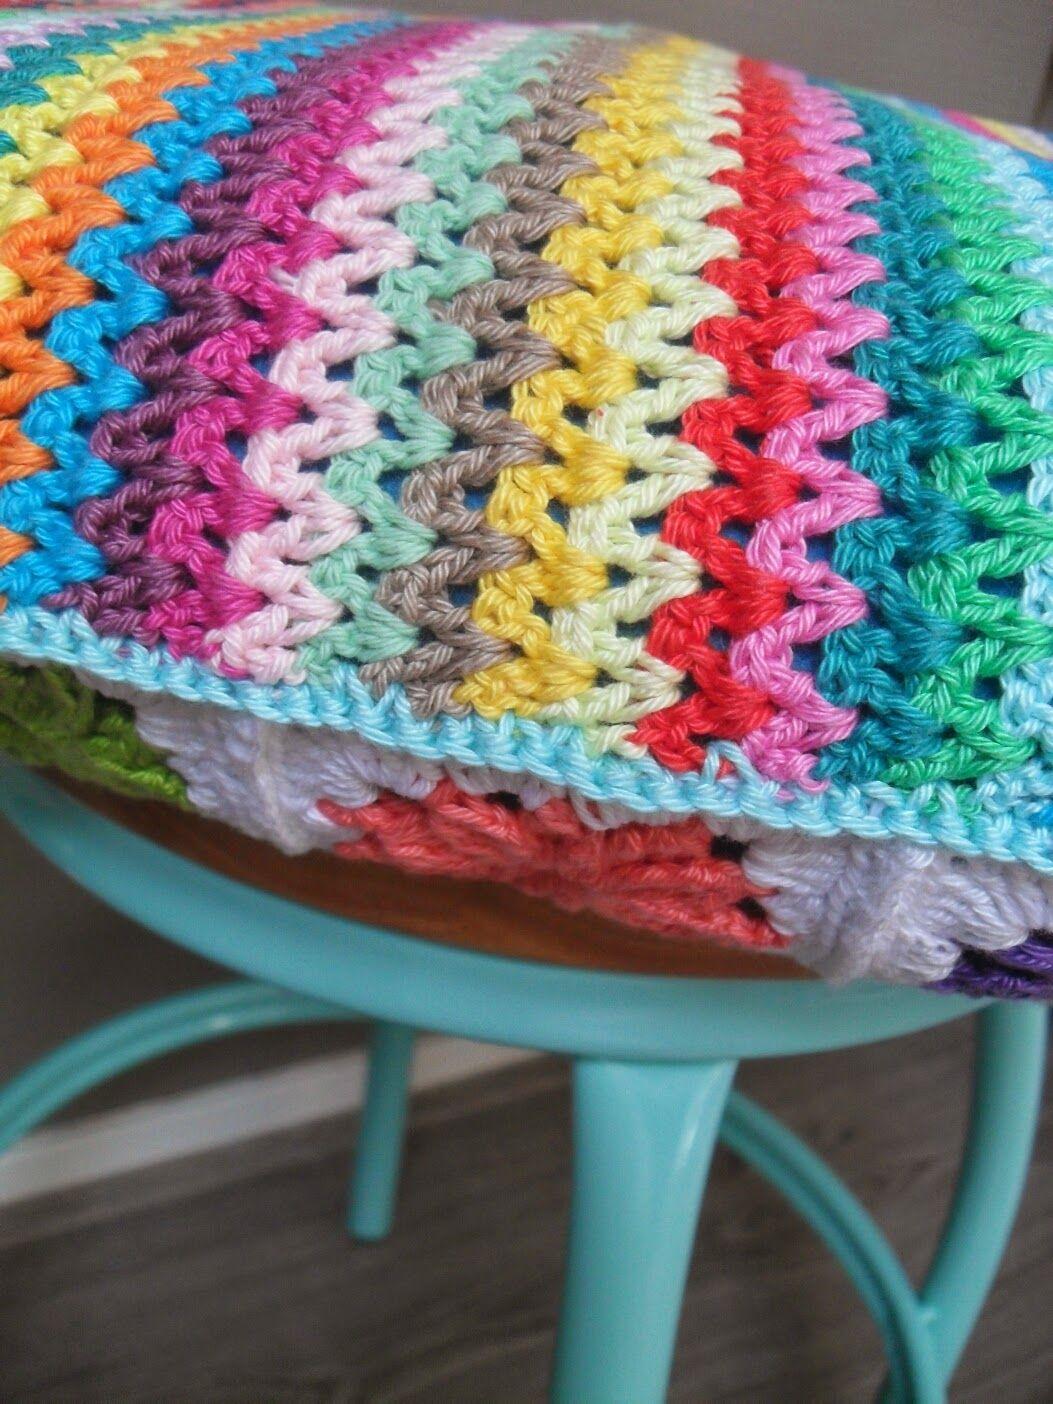 Hooked by Marijtje Hurray - V-stitch cushion | crochet | Pinterest ...